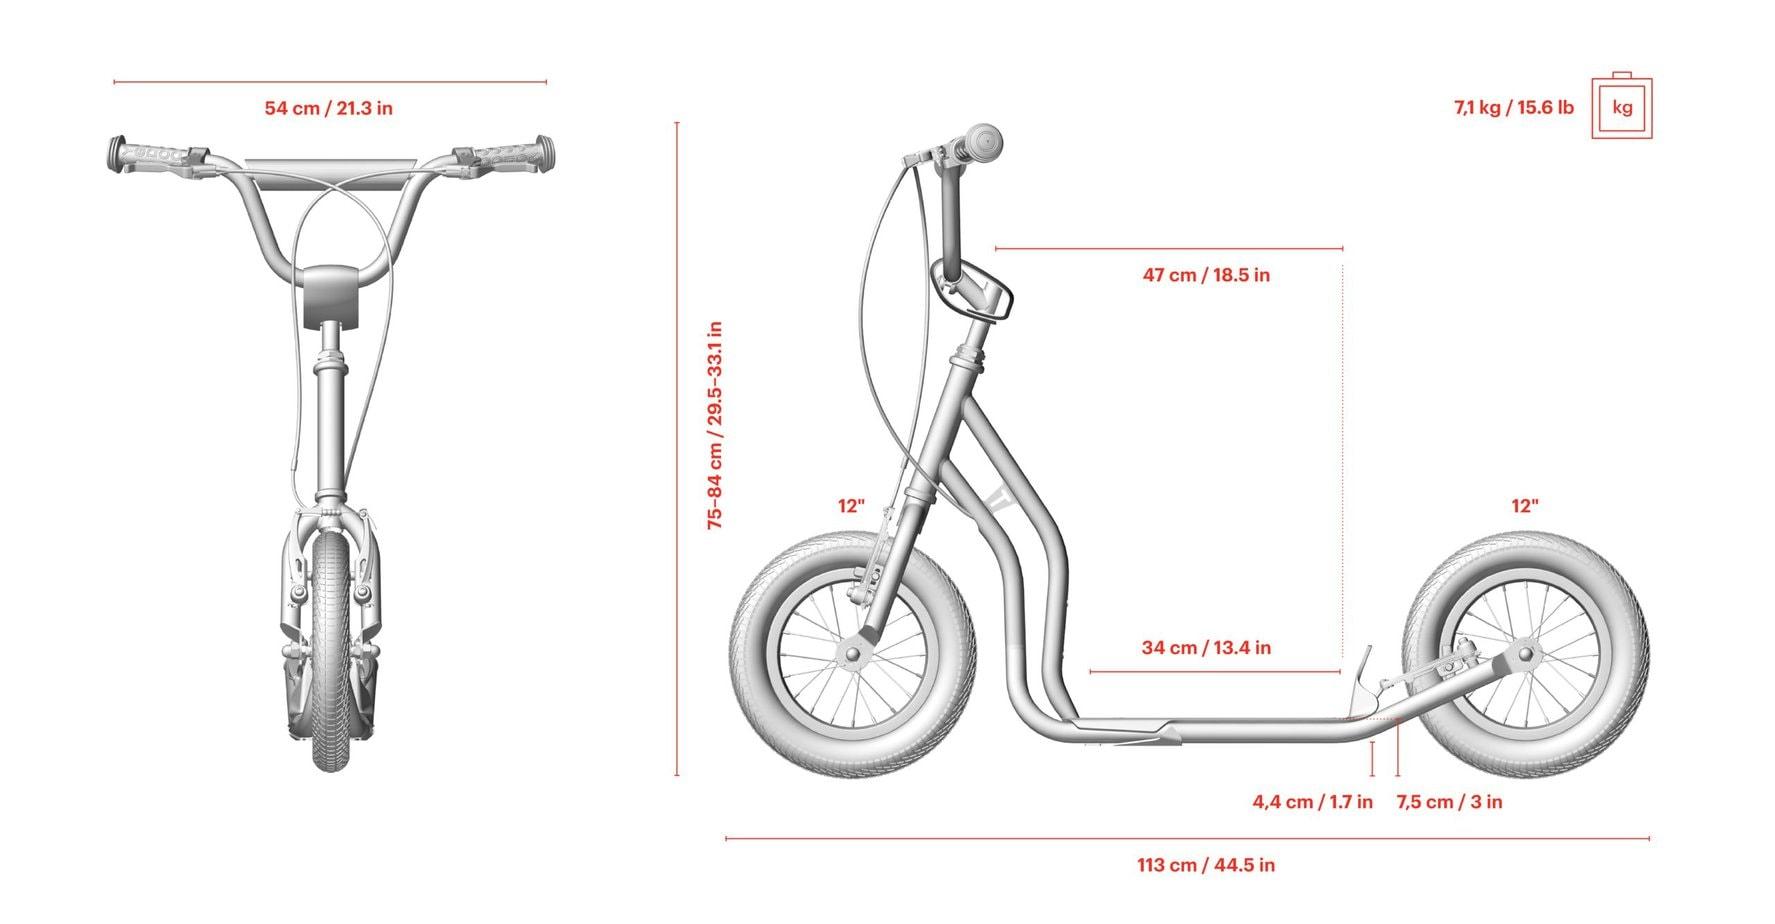 Yedoo New Tidit-Maße-Größe-Länge